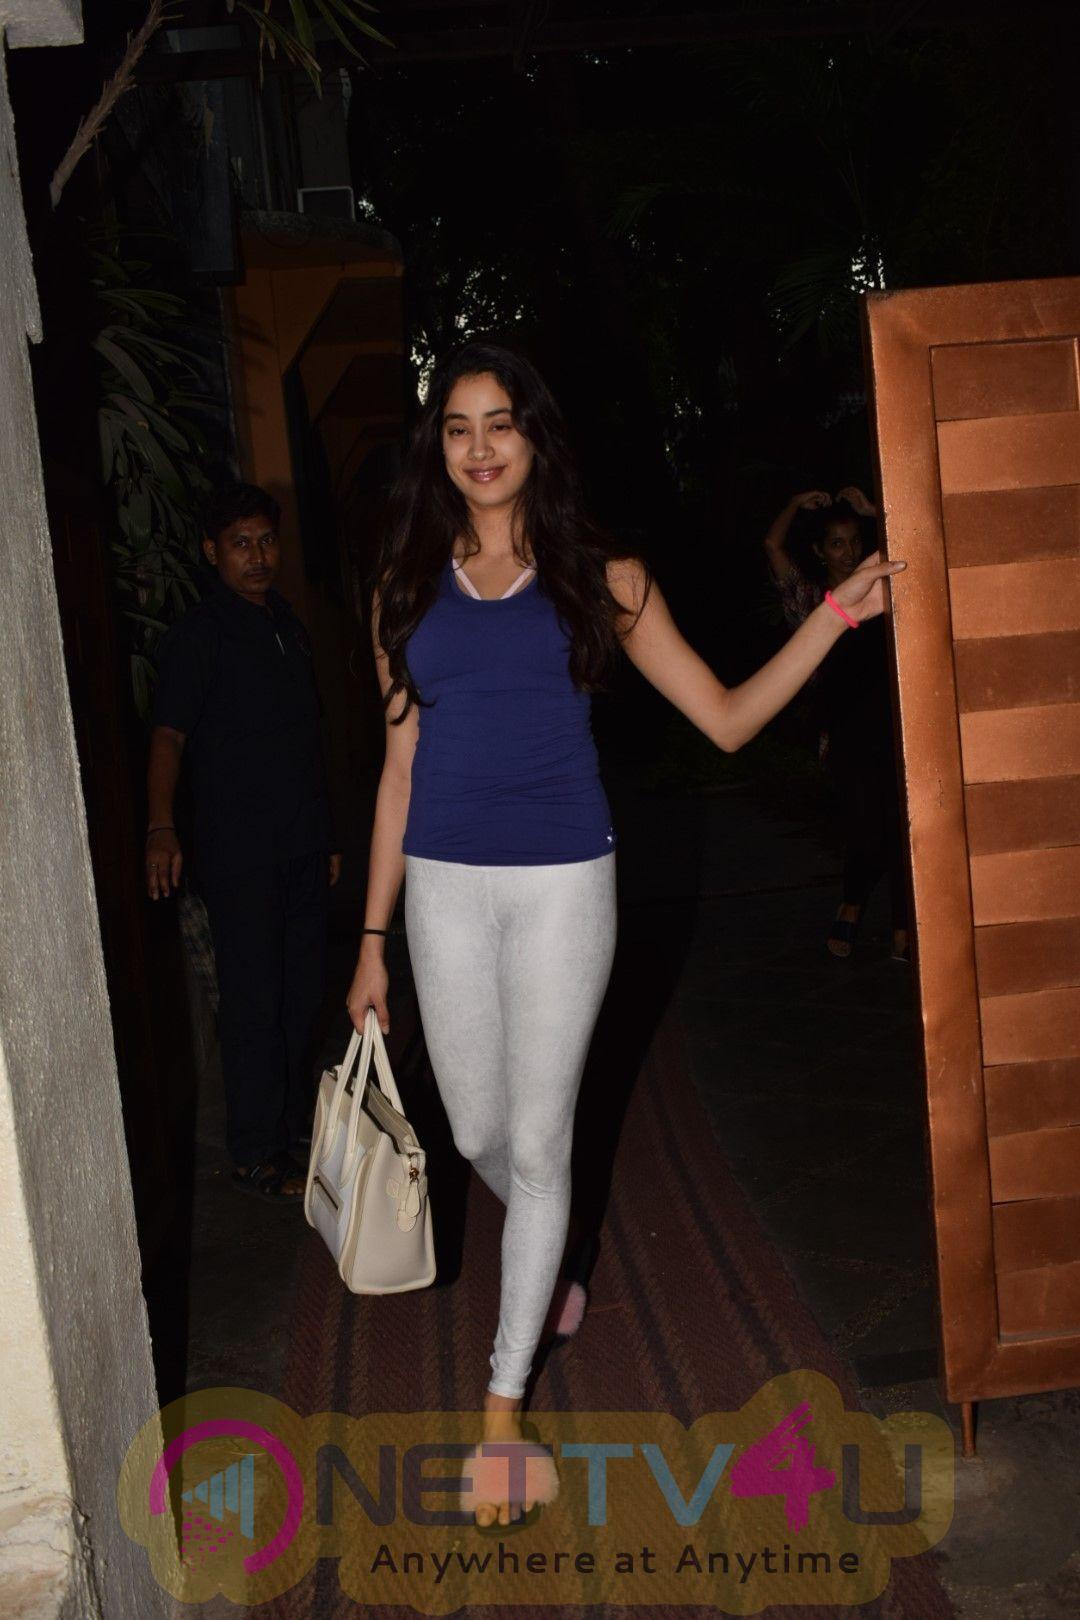 Pics Of Sridevi's Daughter Jahnavi Kapoor At Juhu